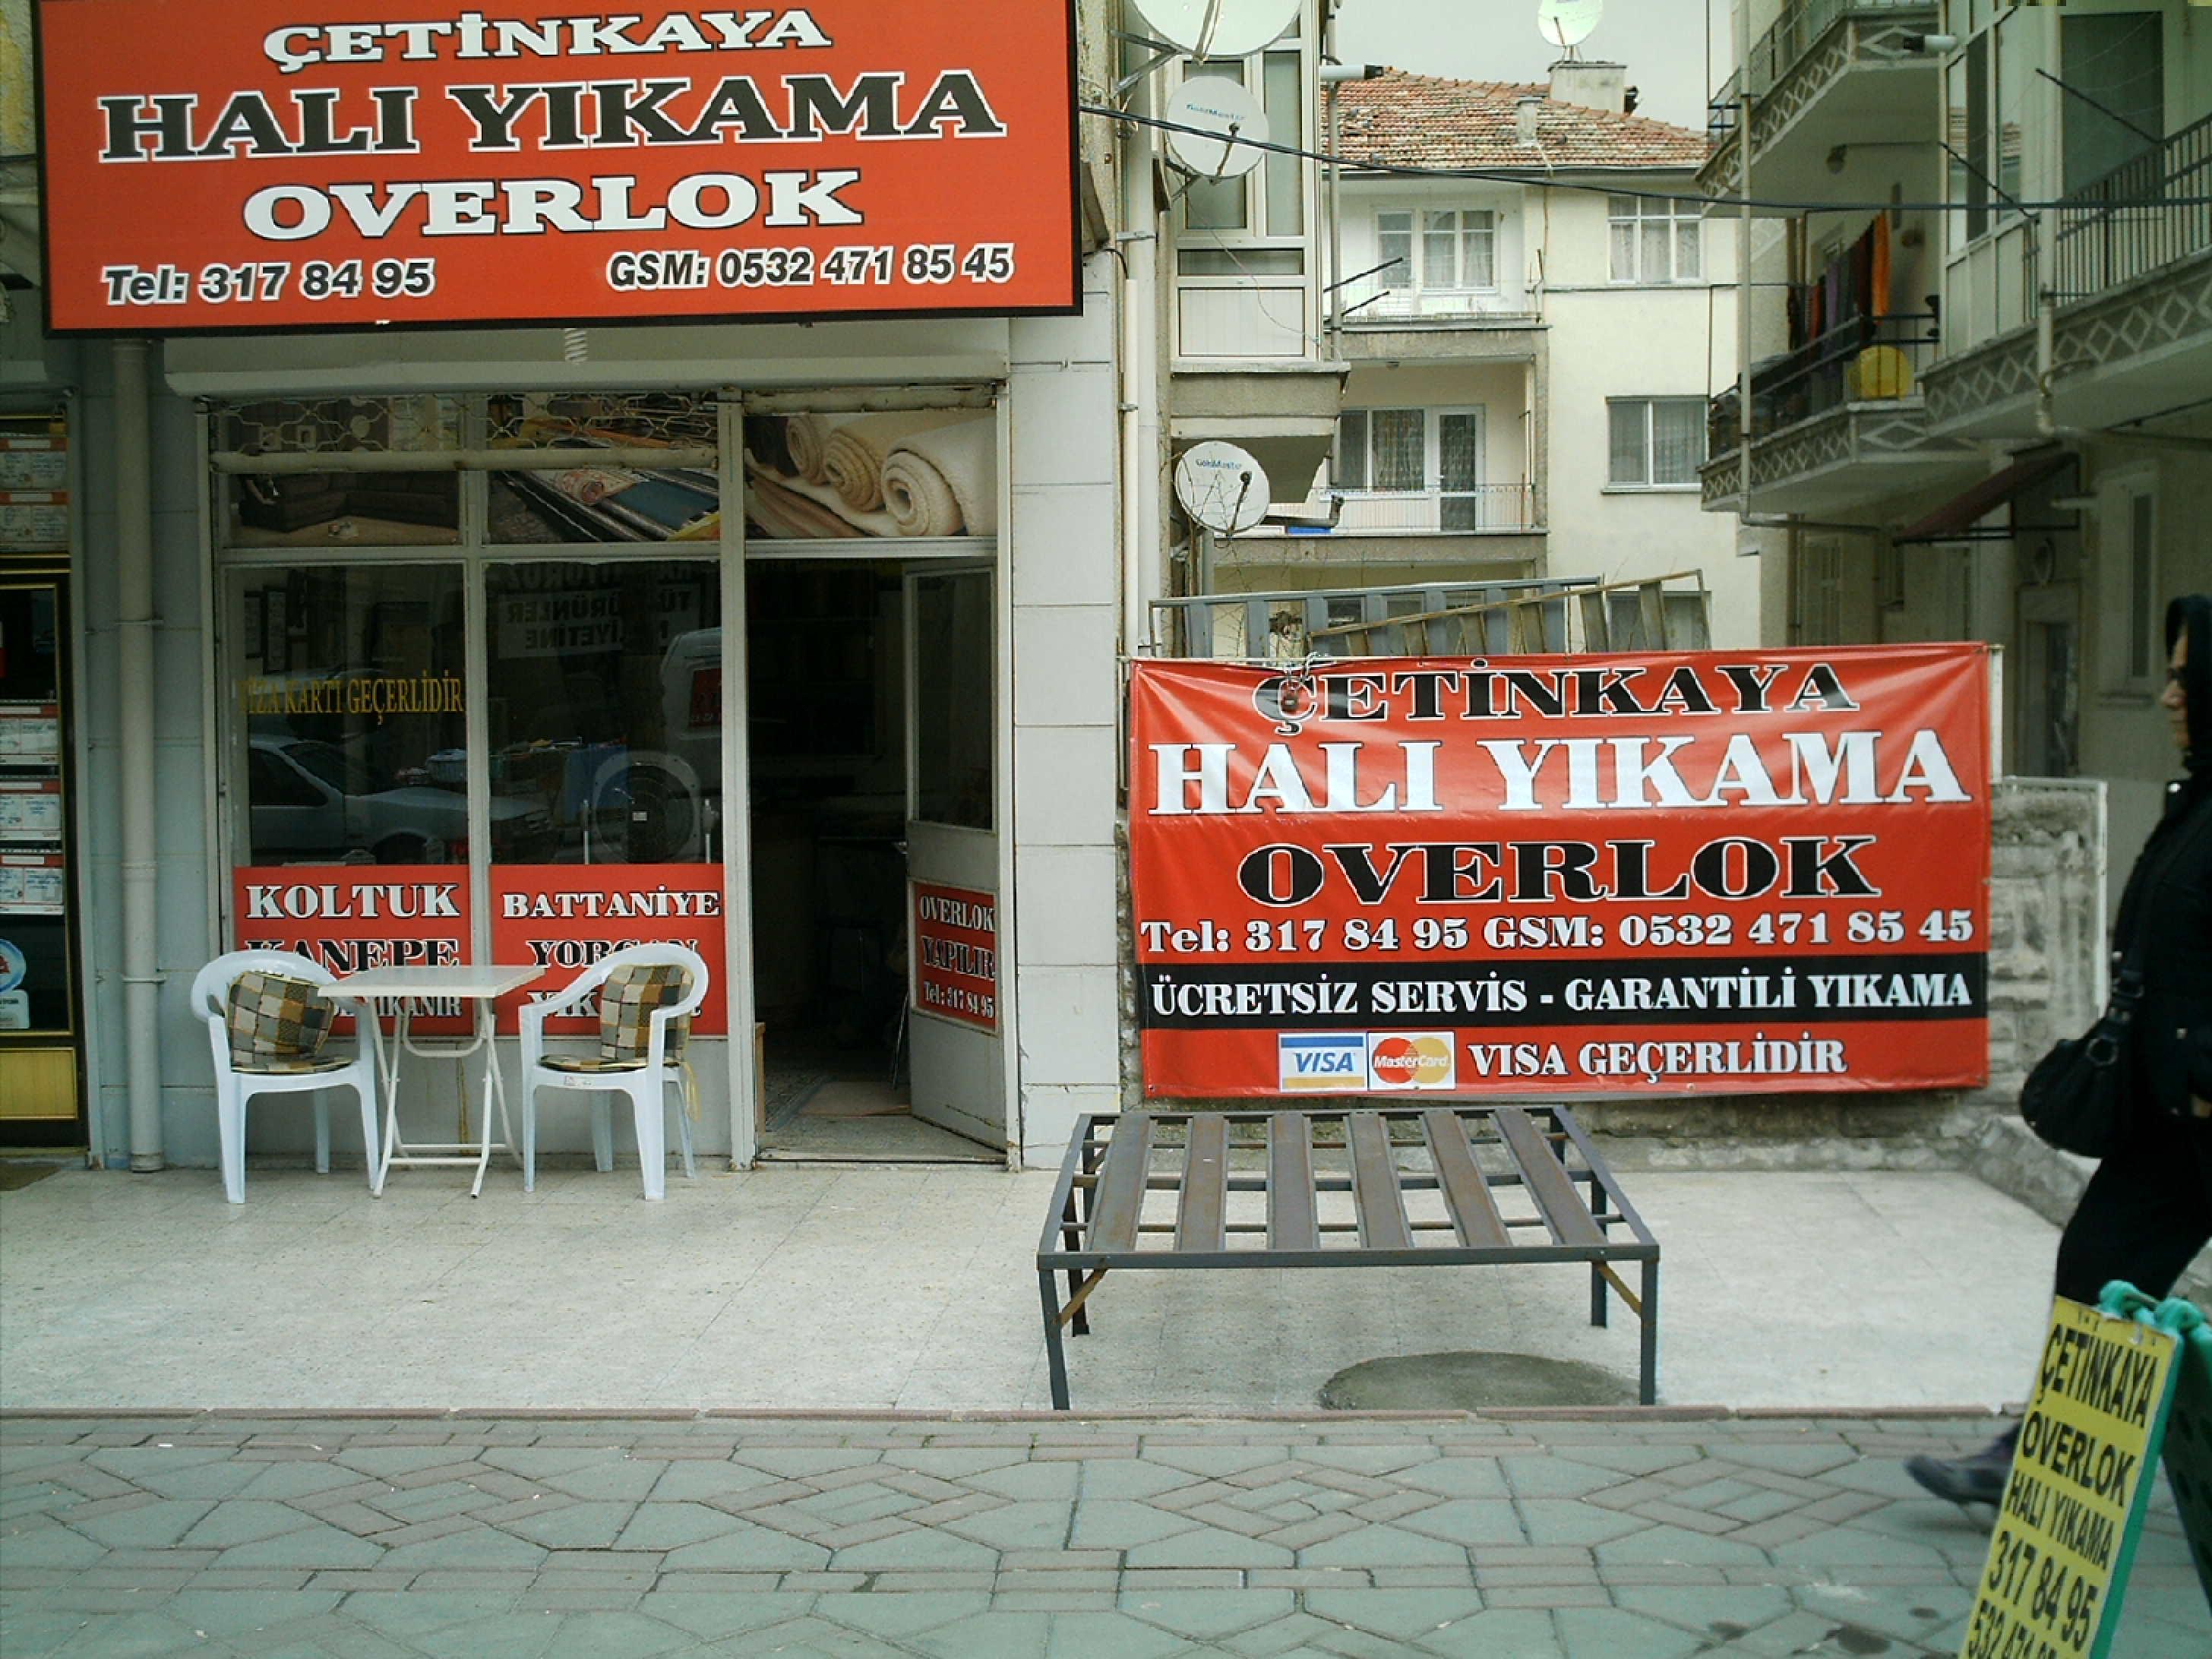 kamil_ocaki_hali_yikama_servis-1 (2)